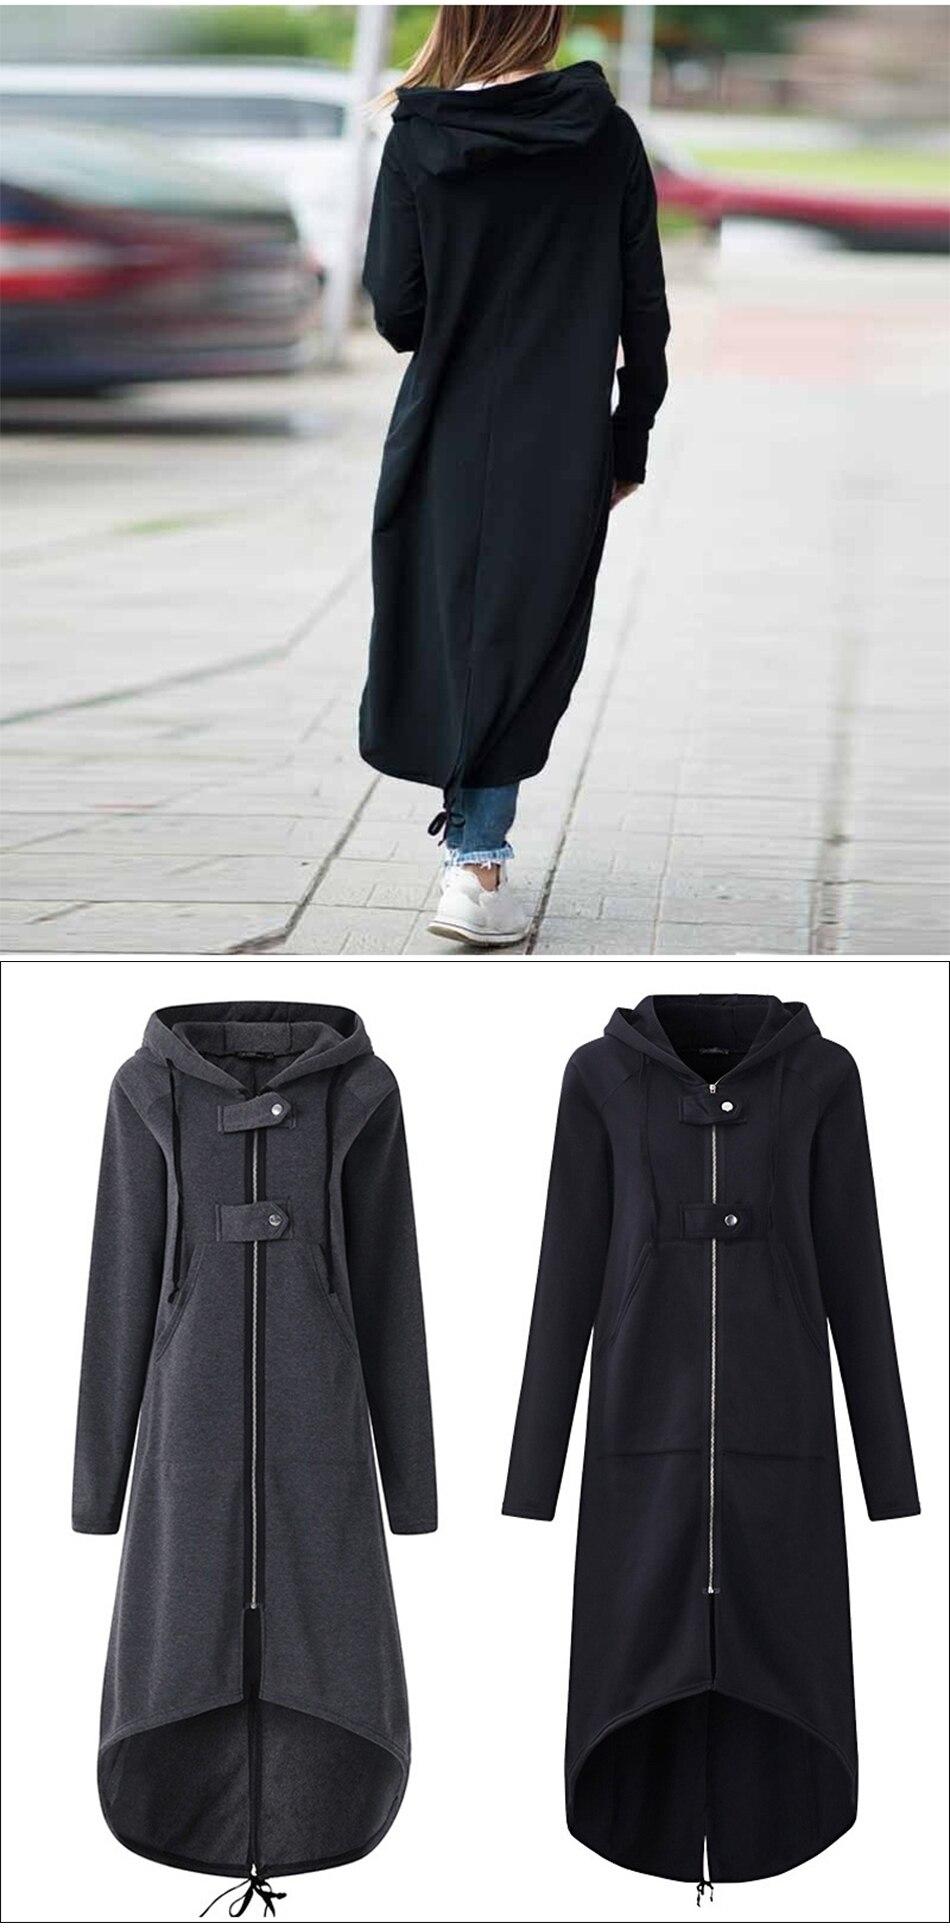 CROPKOP Fashion Long Sleeve Hooded Trench Coat 18 Autumn Black Zipper Plus Size 5XL Velvet Long Coat Women Overcoat Clothes 2